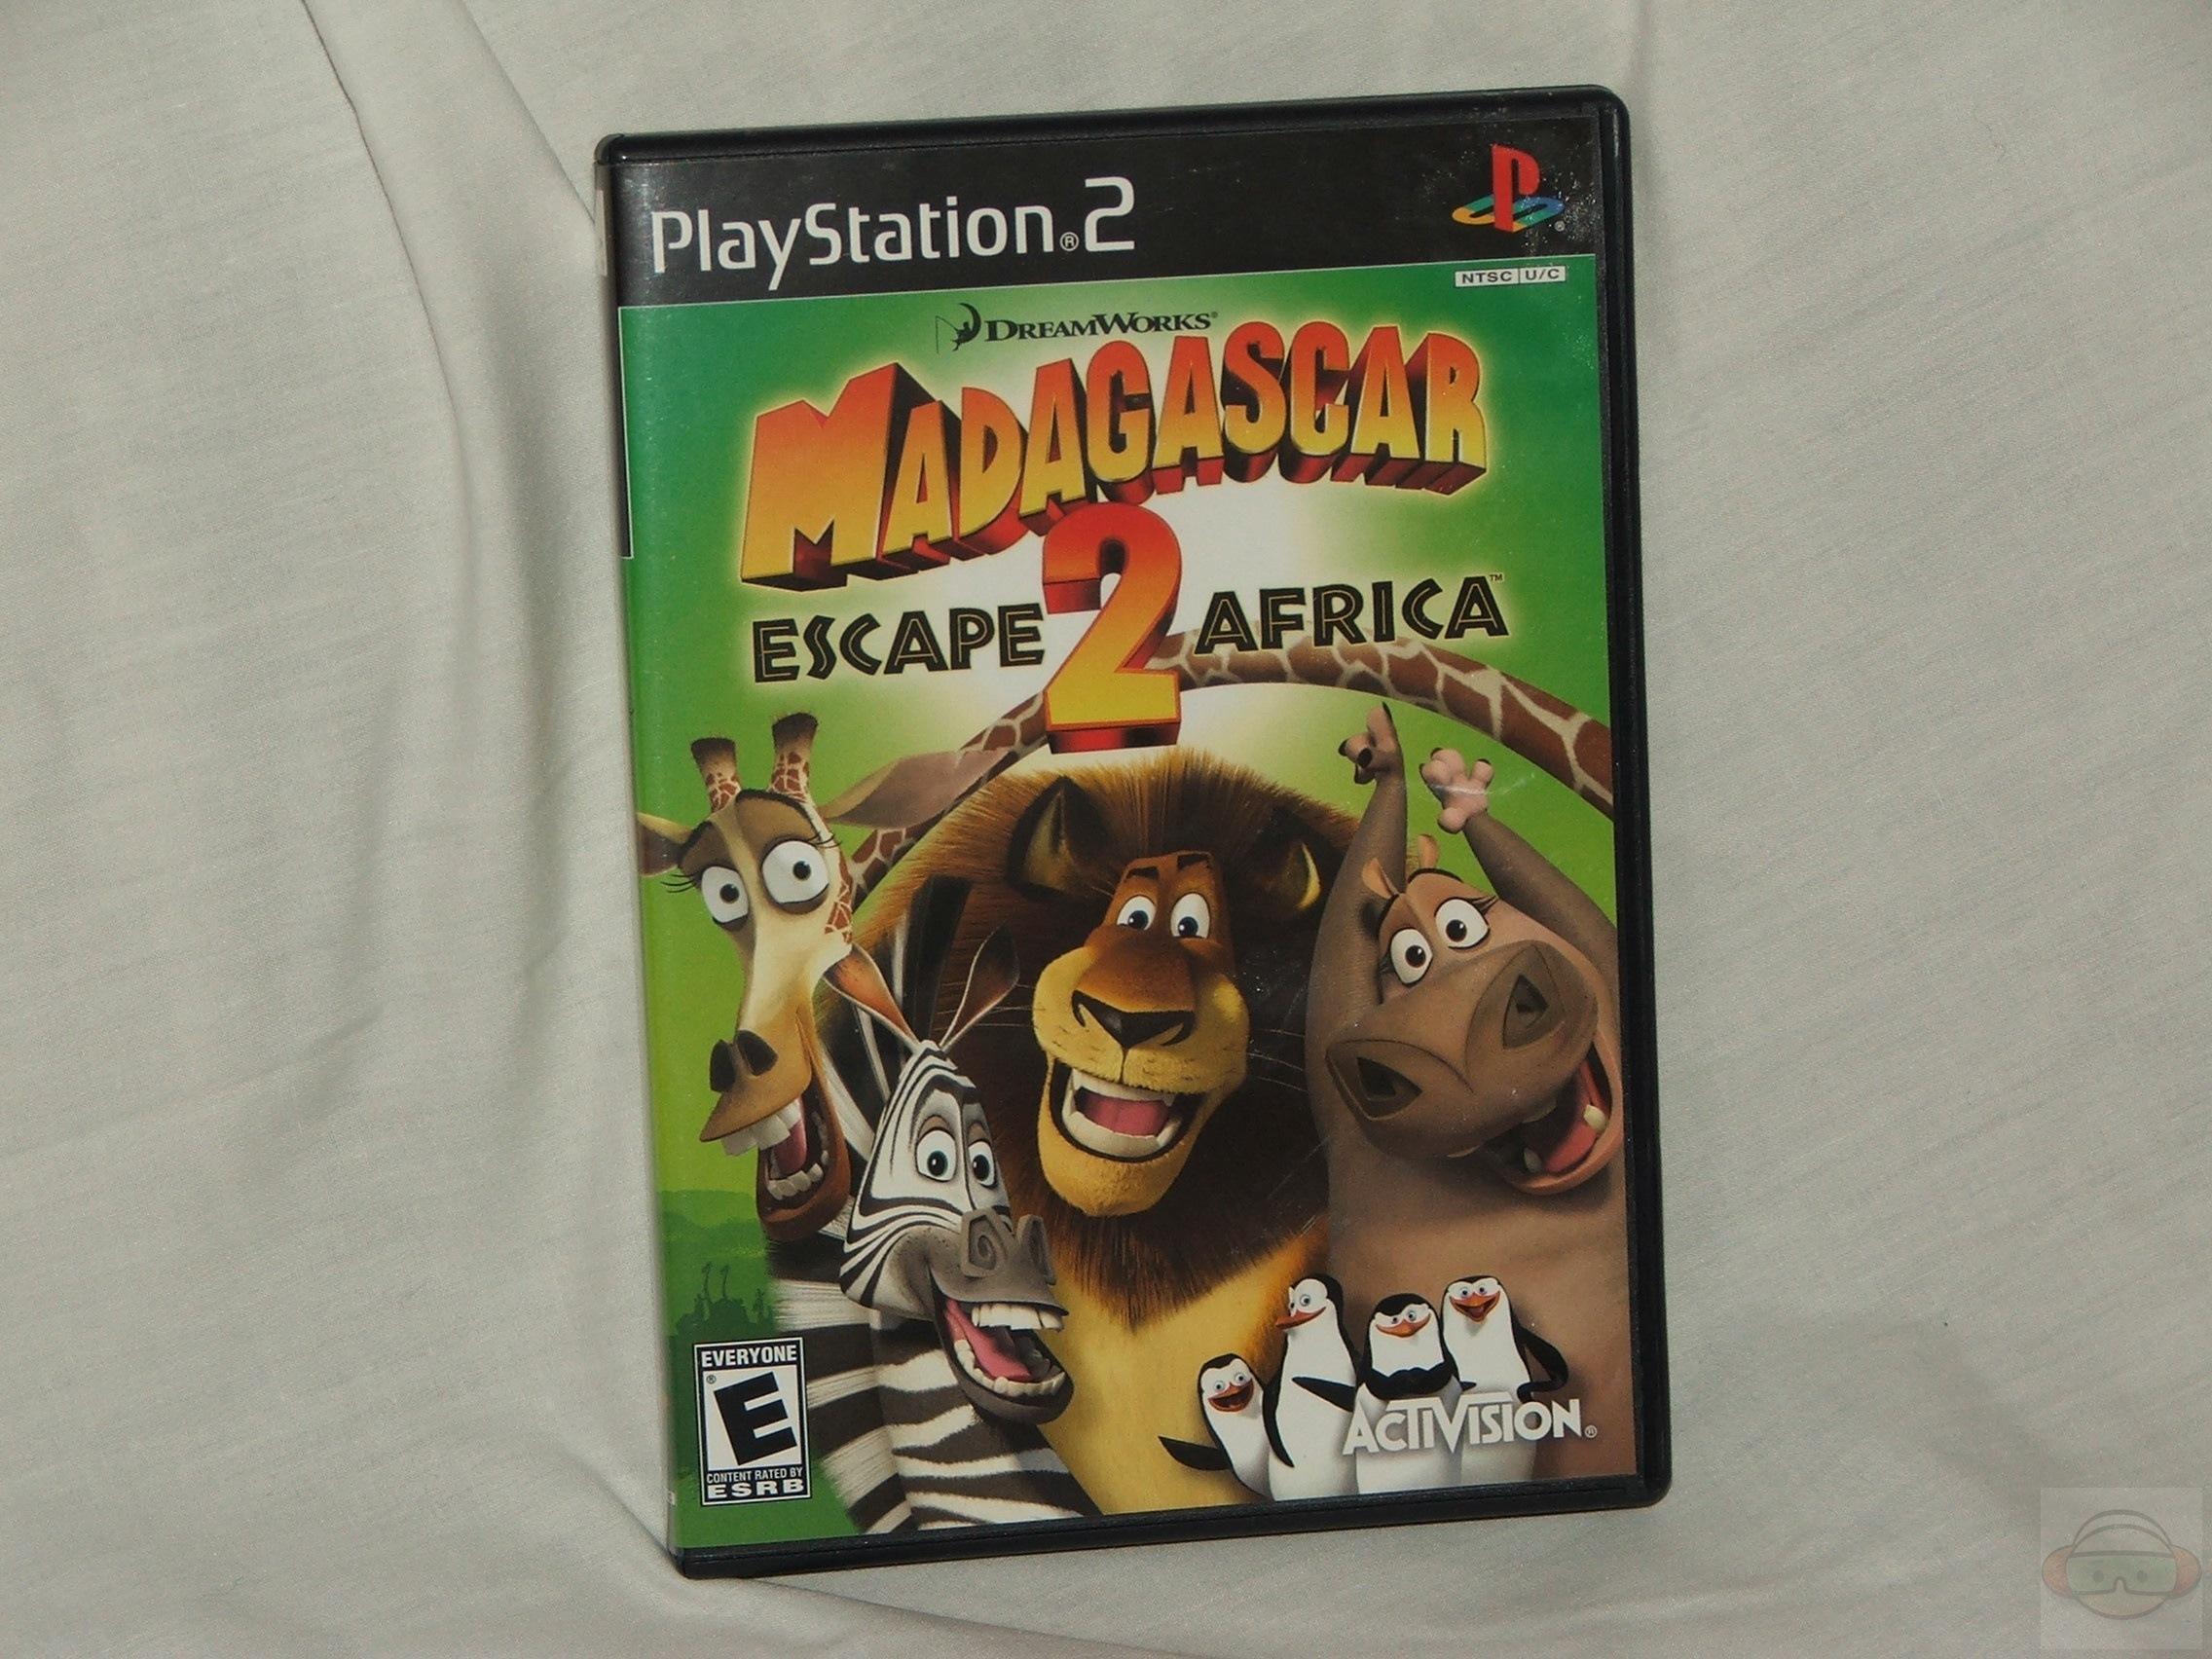 Madagascar 2 Escape 2 Africa PS2 | Technogog